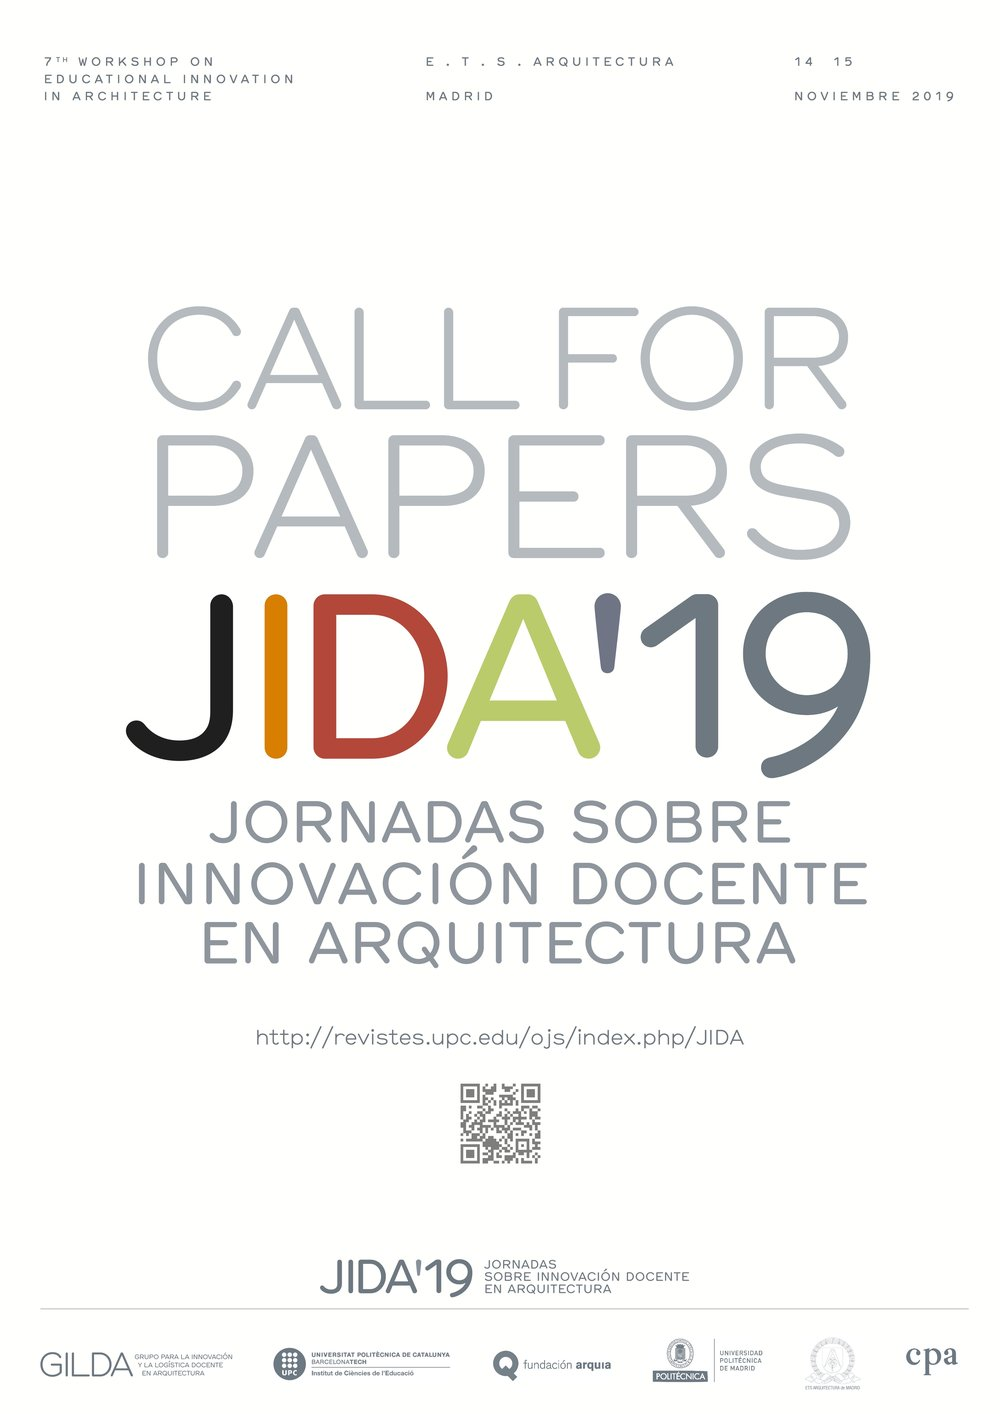 03_JIDA'19_impresión_cartel A3_call_for_papers_190225.jpg